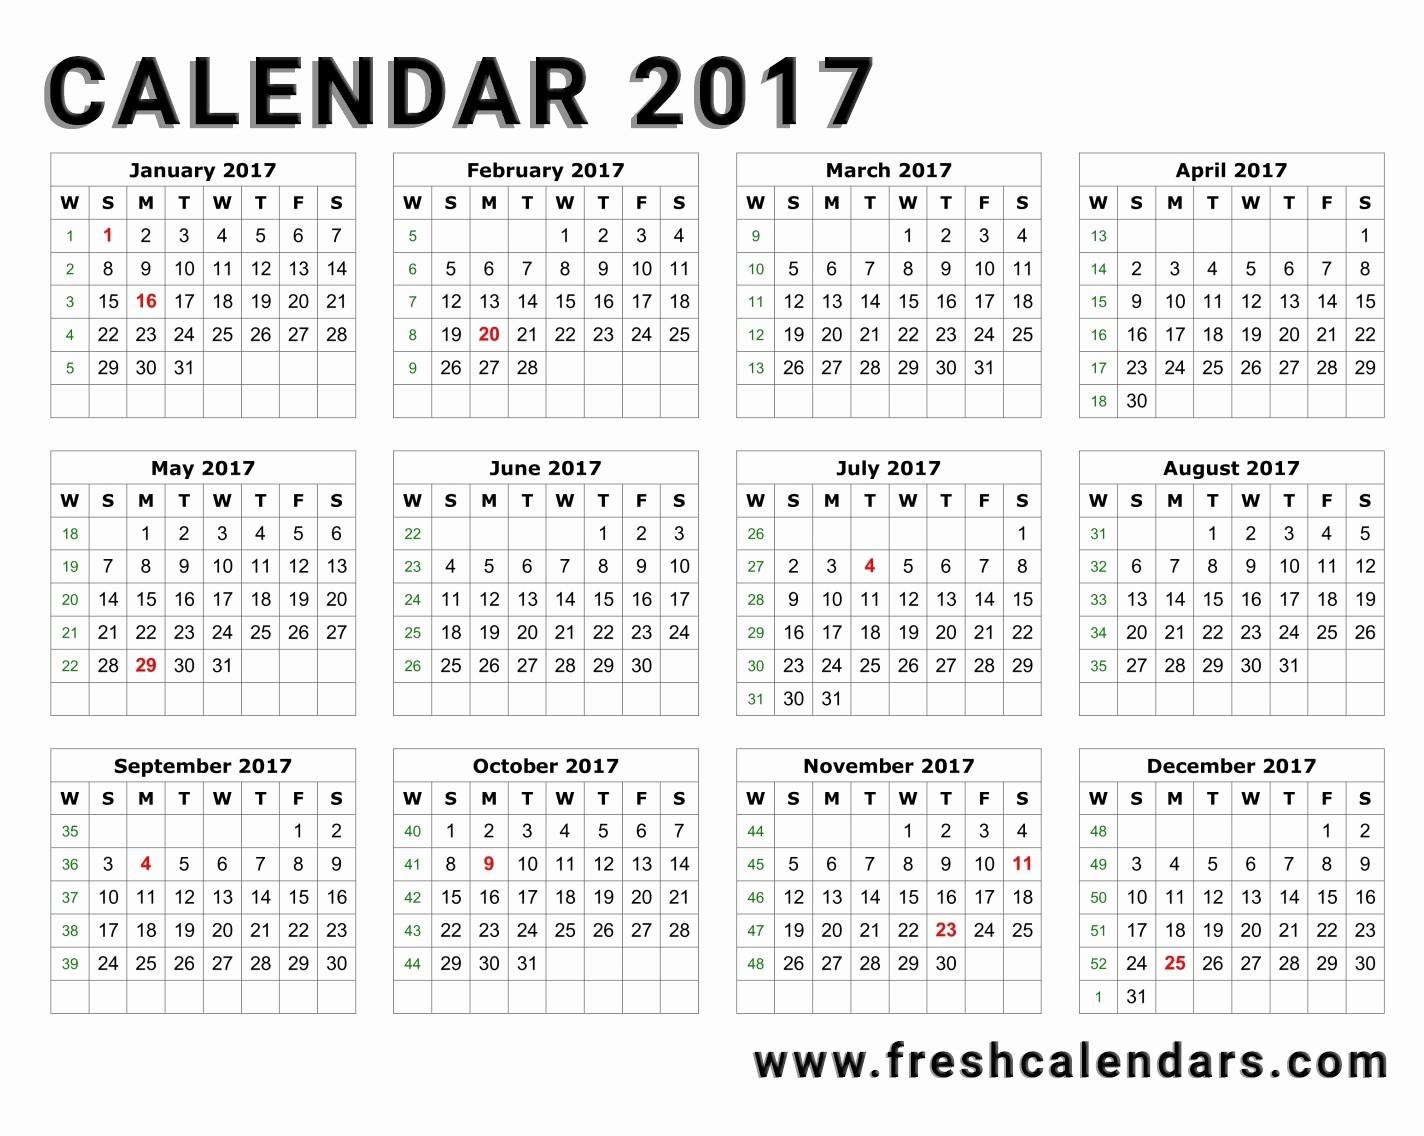 2017 Year Calendar Printable Free Best Of 20 Printable 2017 Calendar Templates